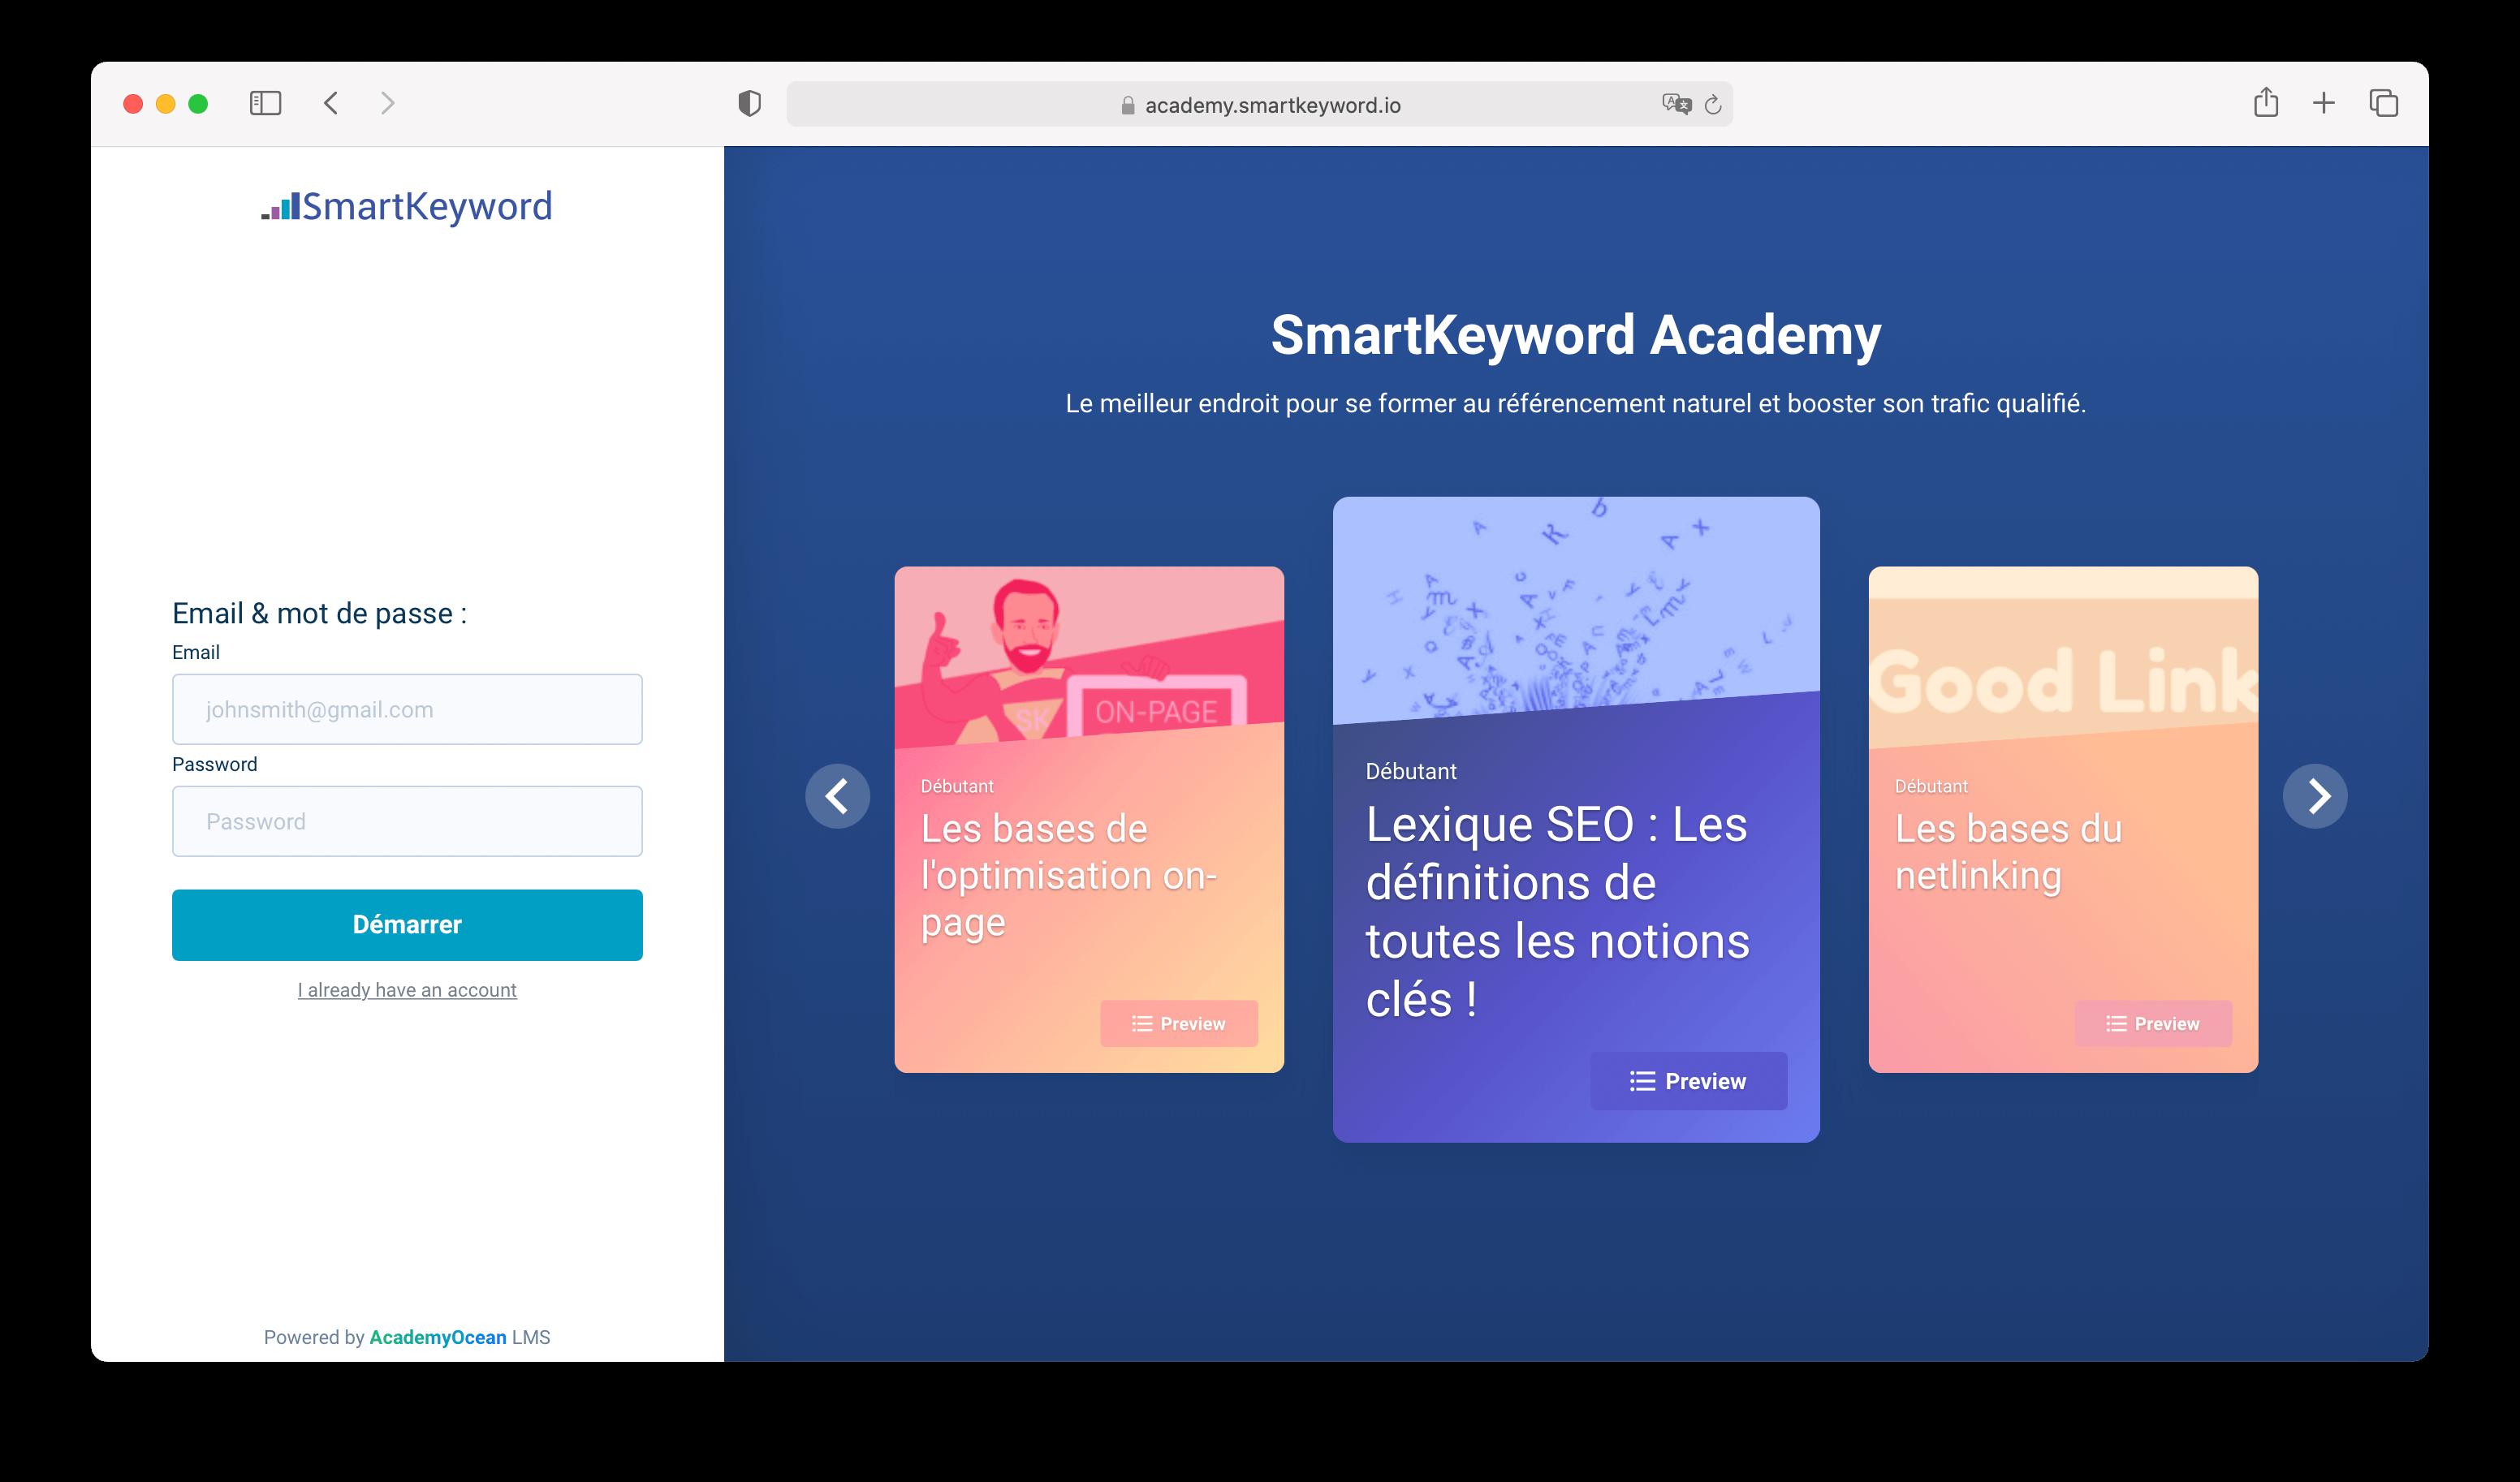 SmartKeyword Academy